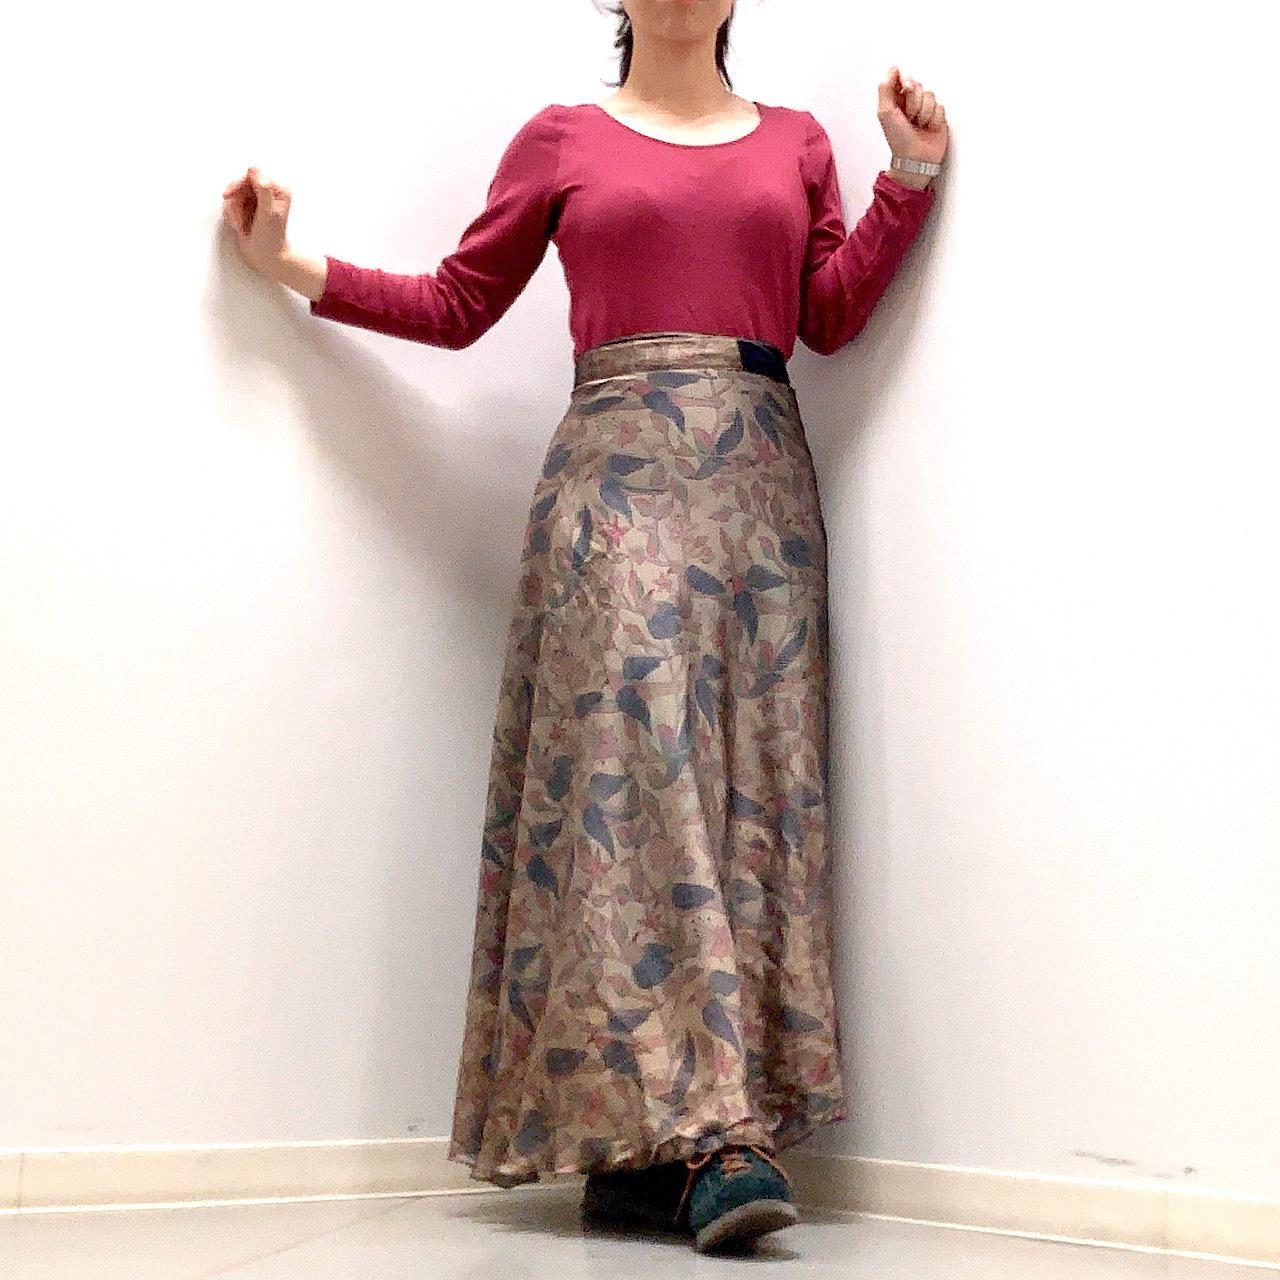 vdsl-007 ビンテージシルクサリー 巻きスカート【ラーマーヤナ】